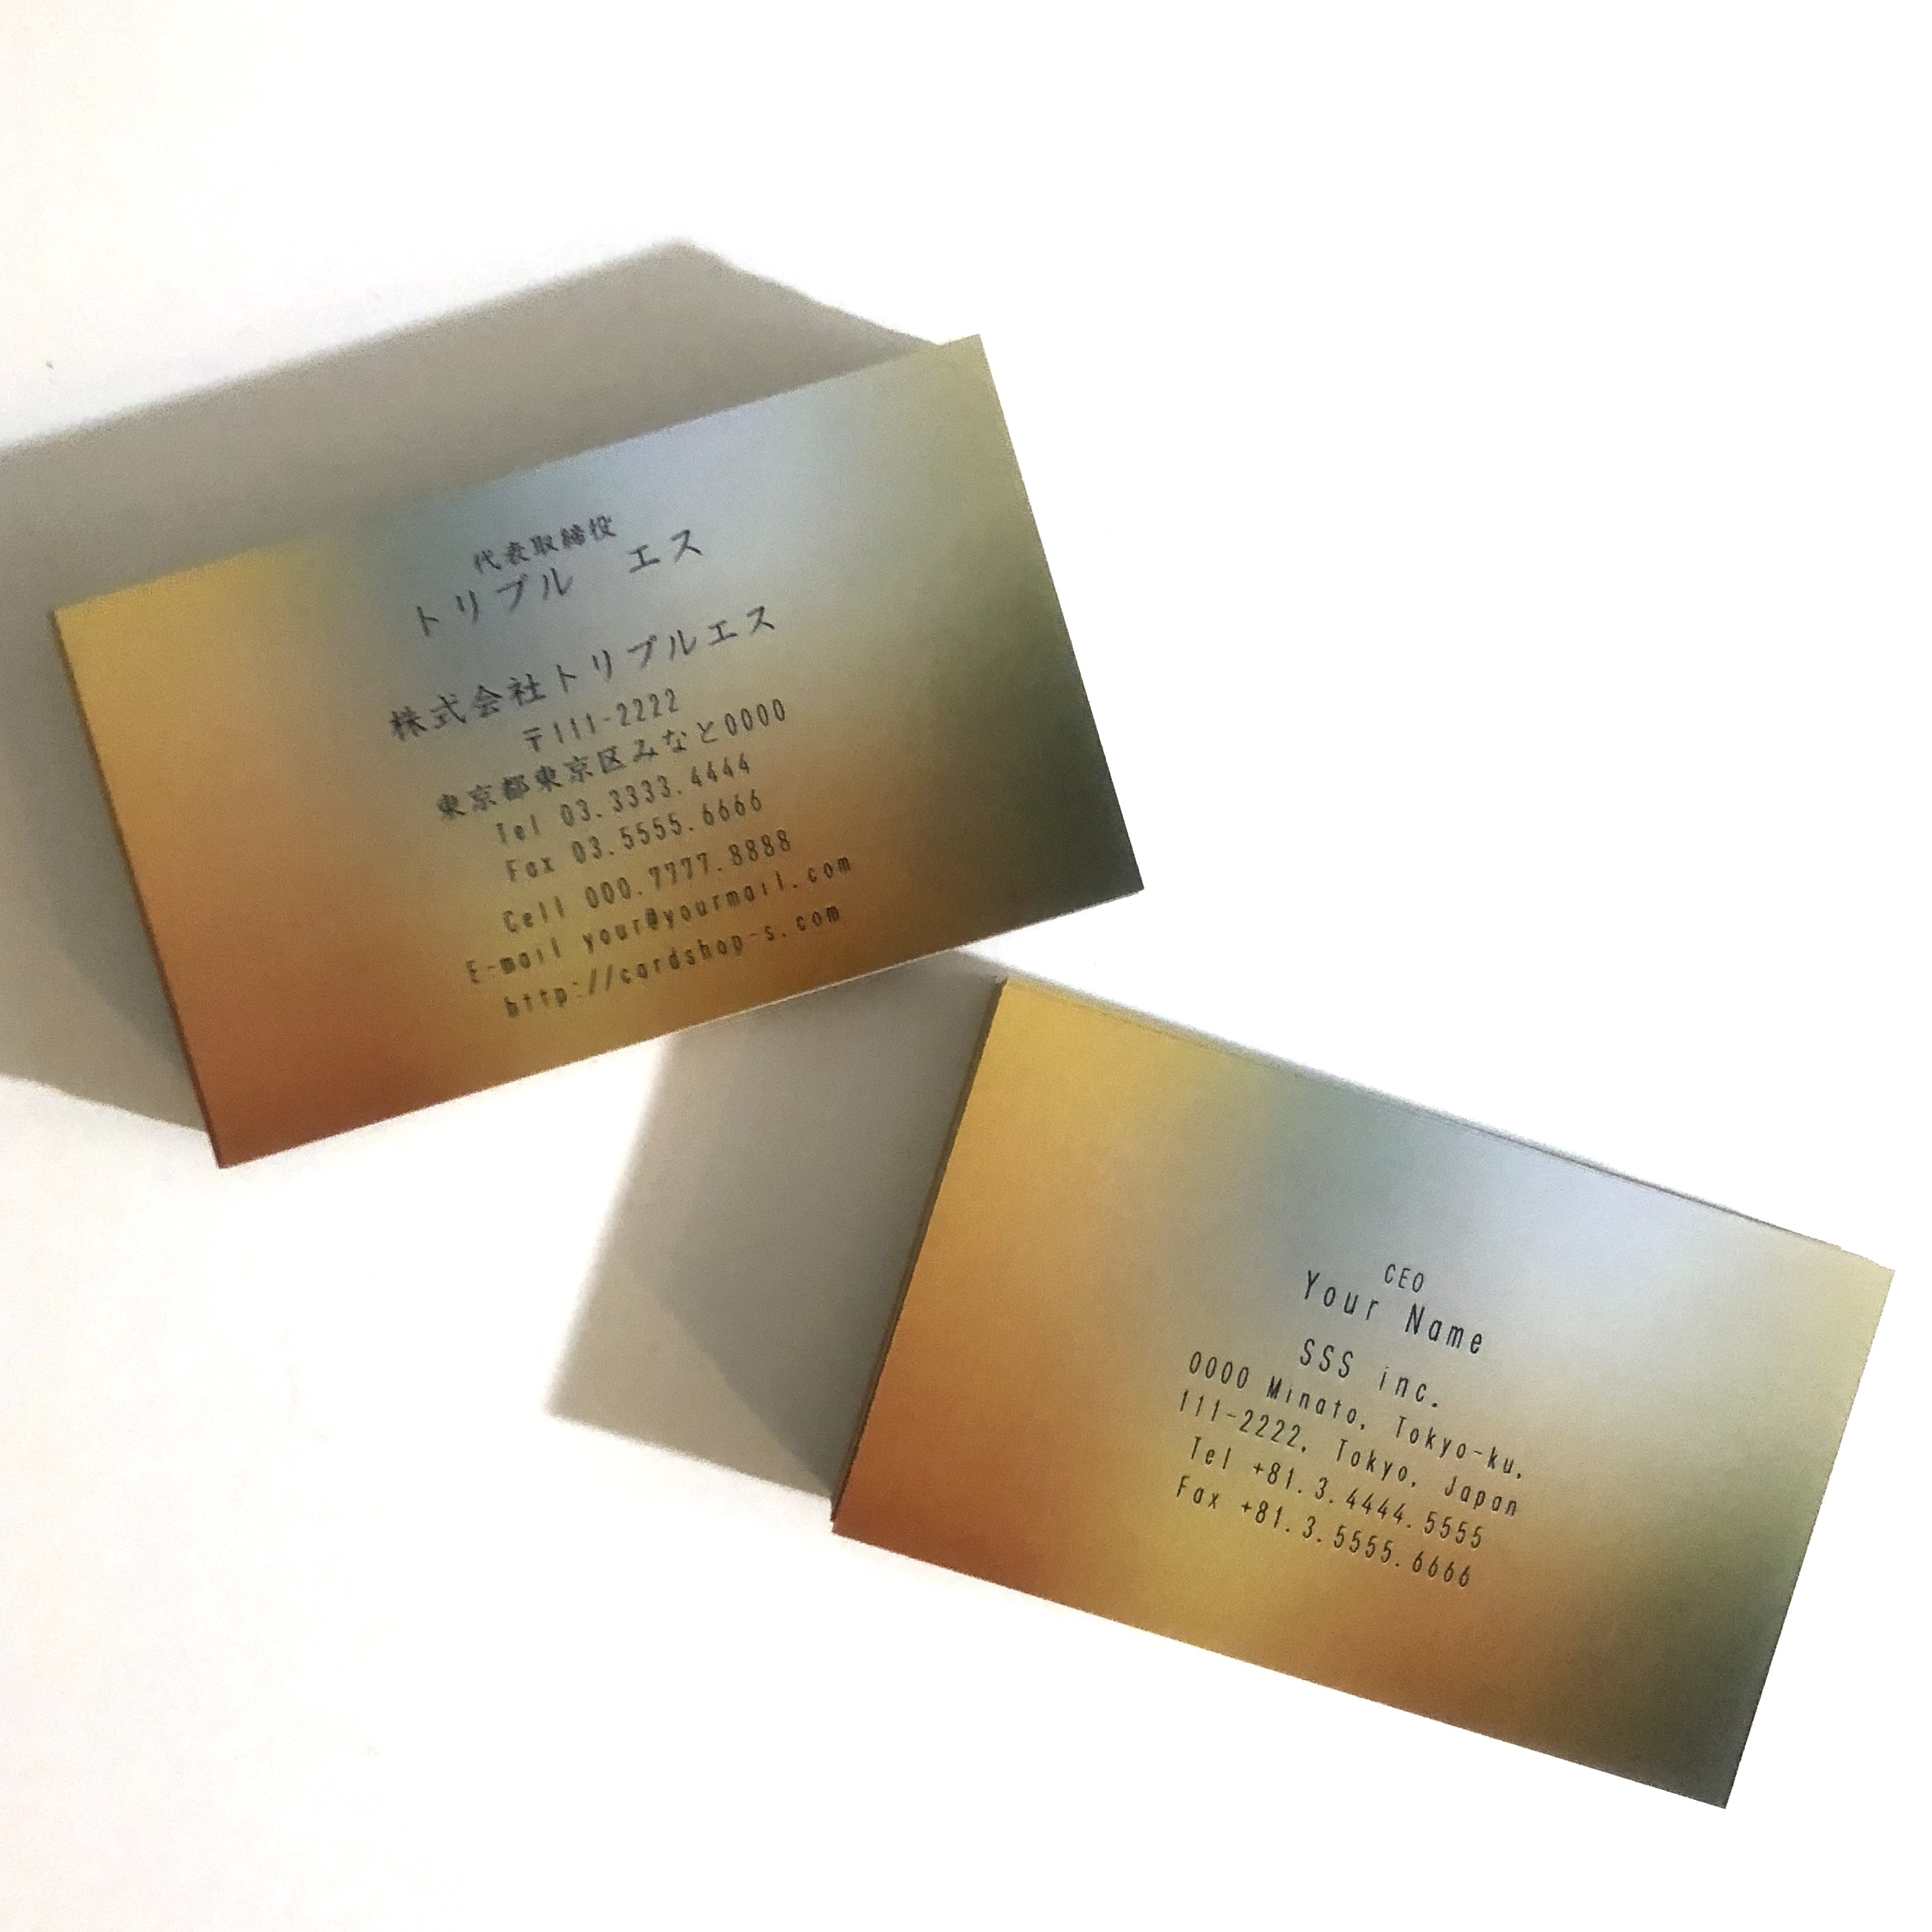 72d1_biz【100枚】ビジネス名刺【英表記】